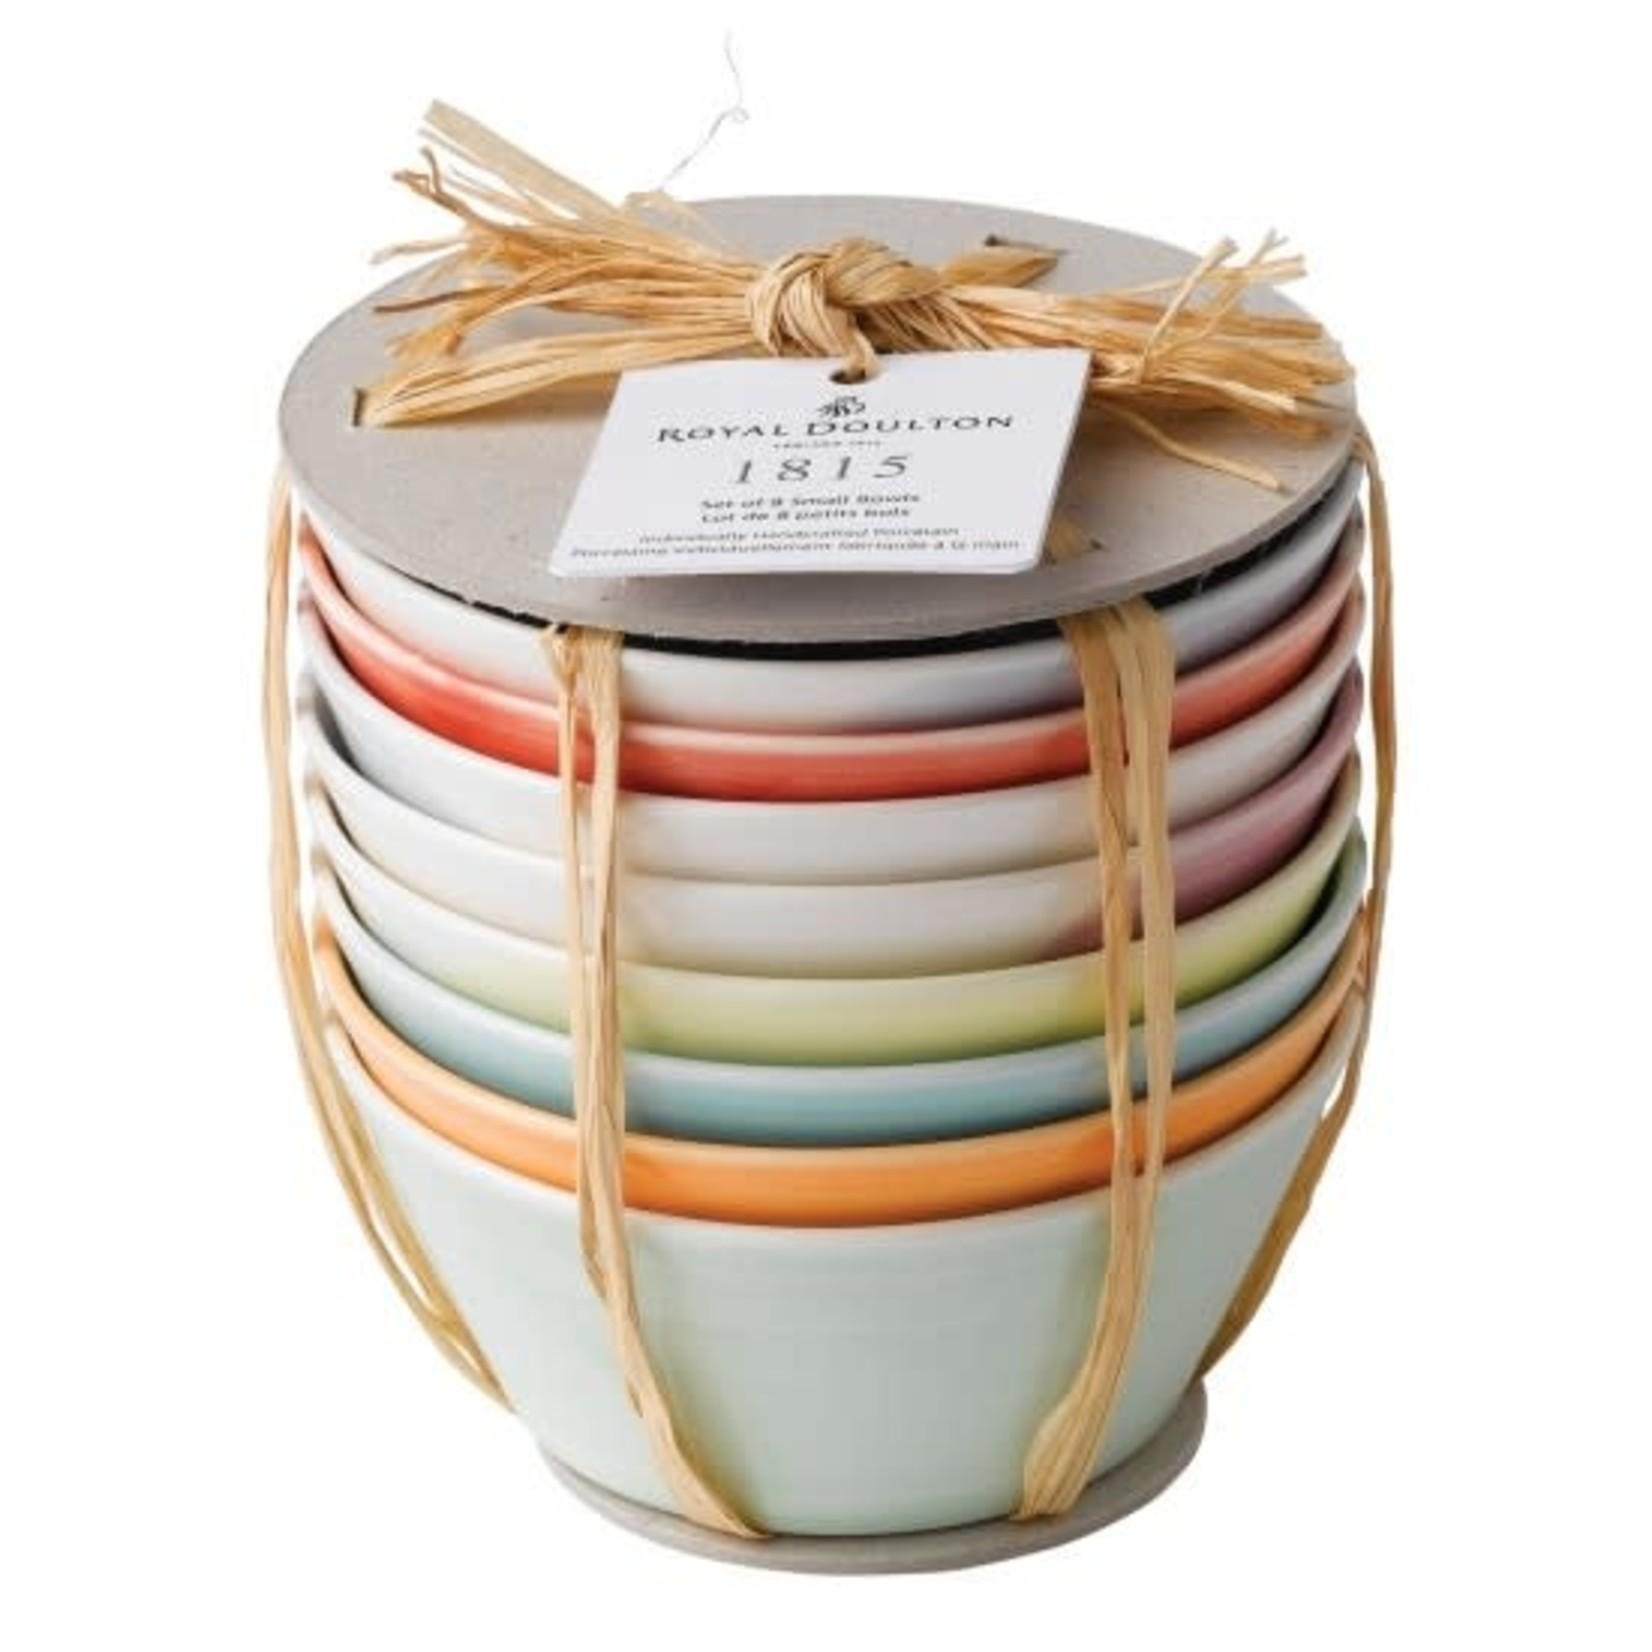 Royal Doulton 1815 Tapas Bowls, Set of 8